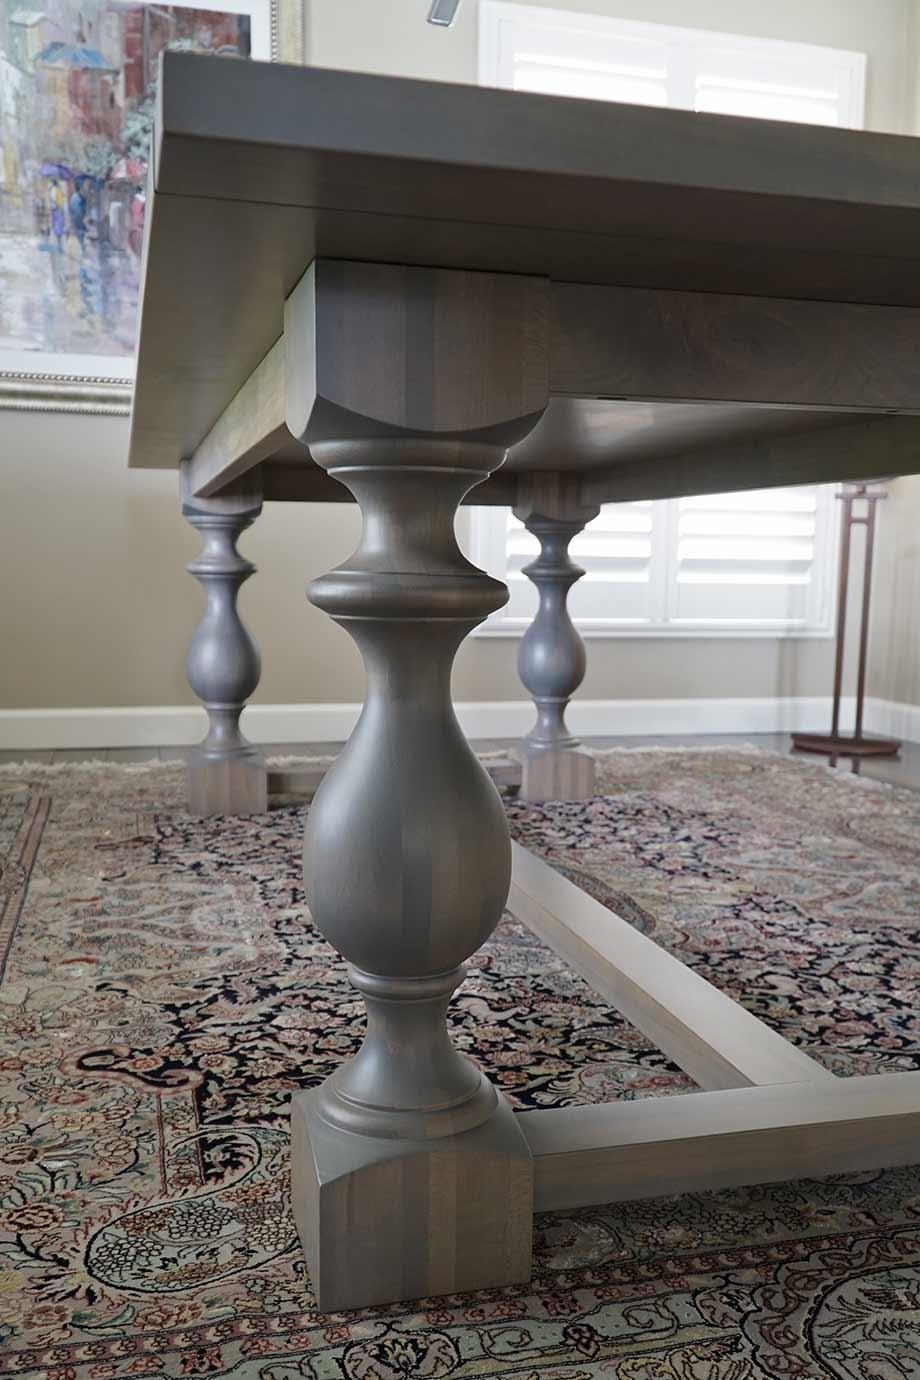 Custom Furniture Handmade In Elkhart, Goshen Mishawaka And South Bend,  Indiana.